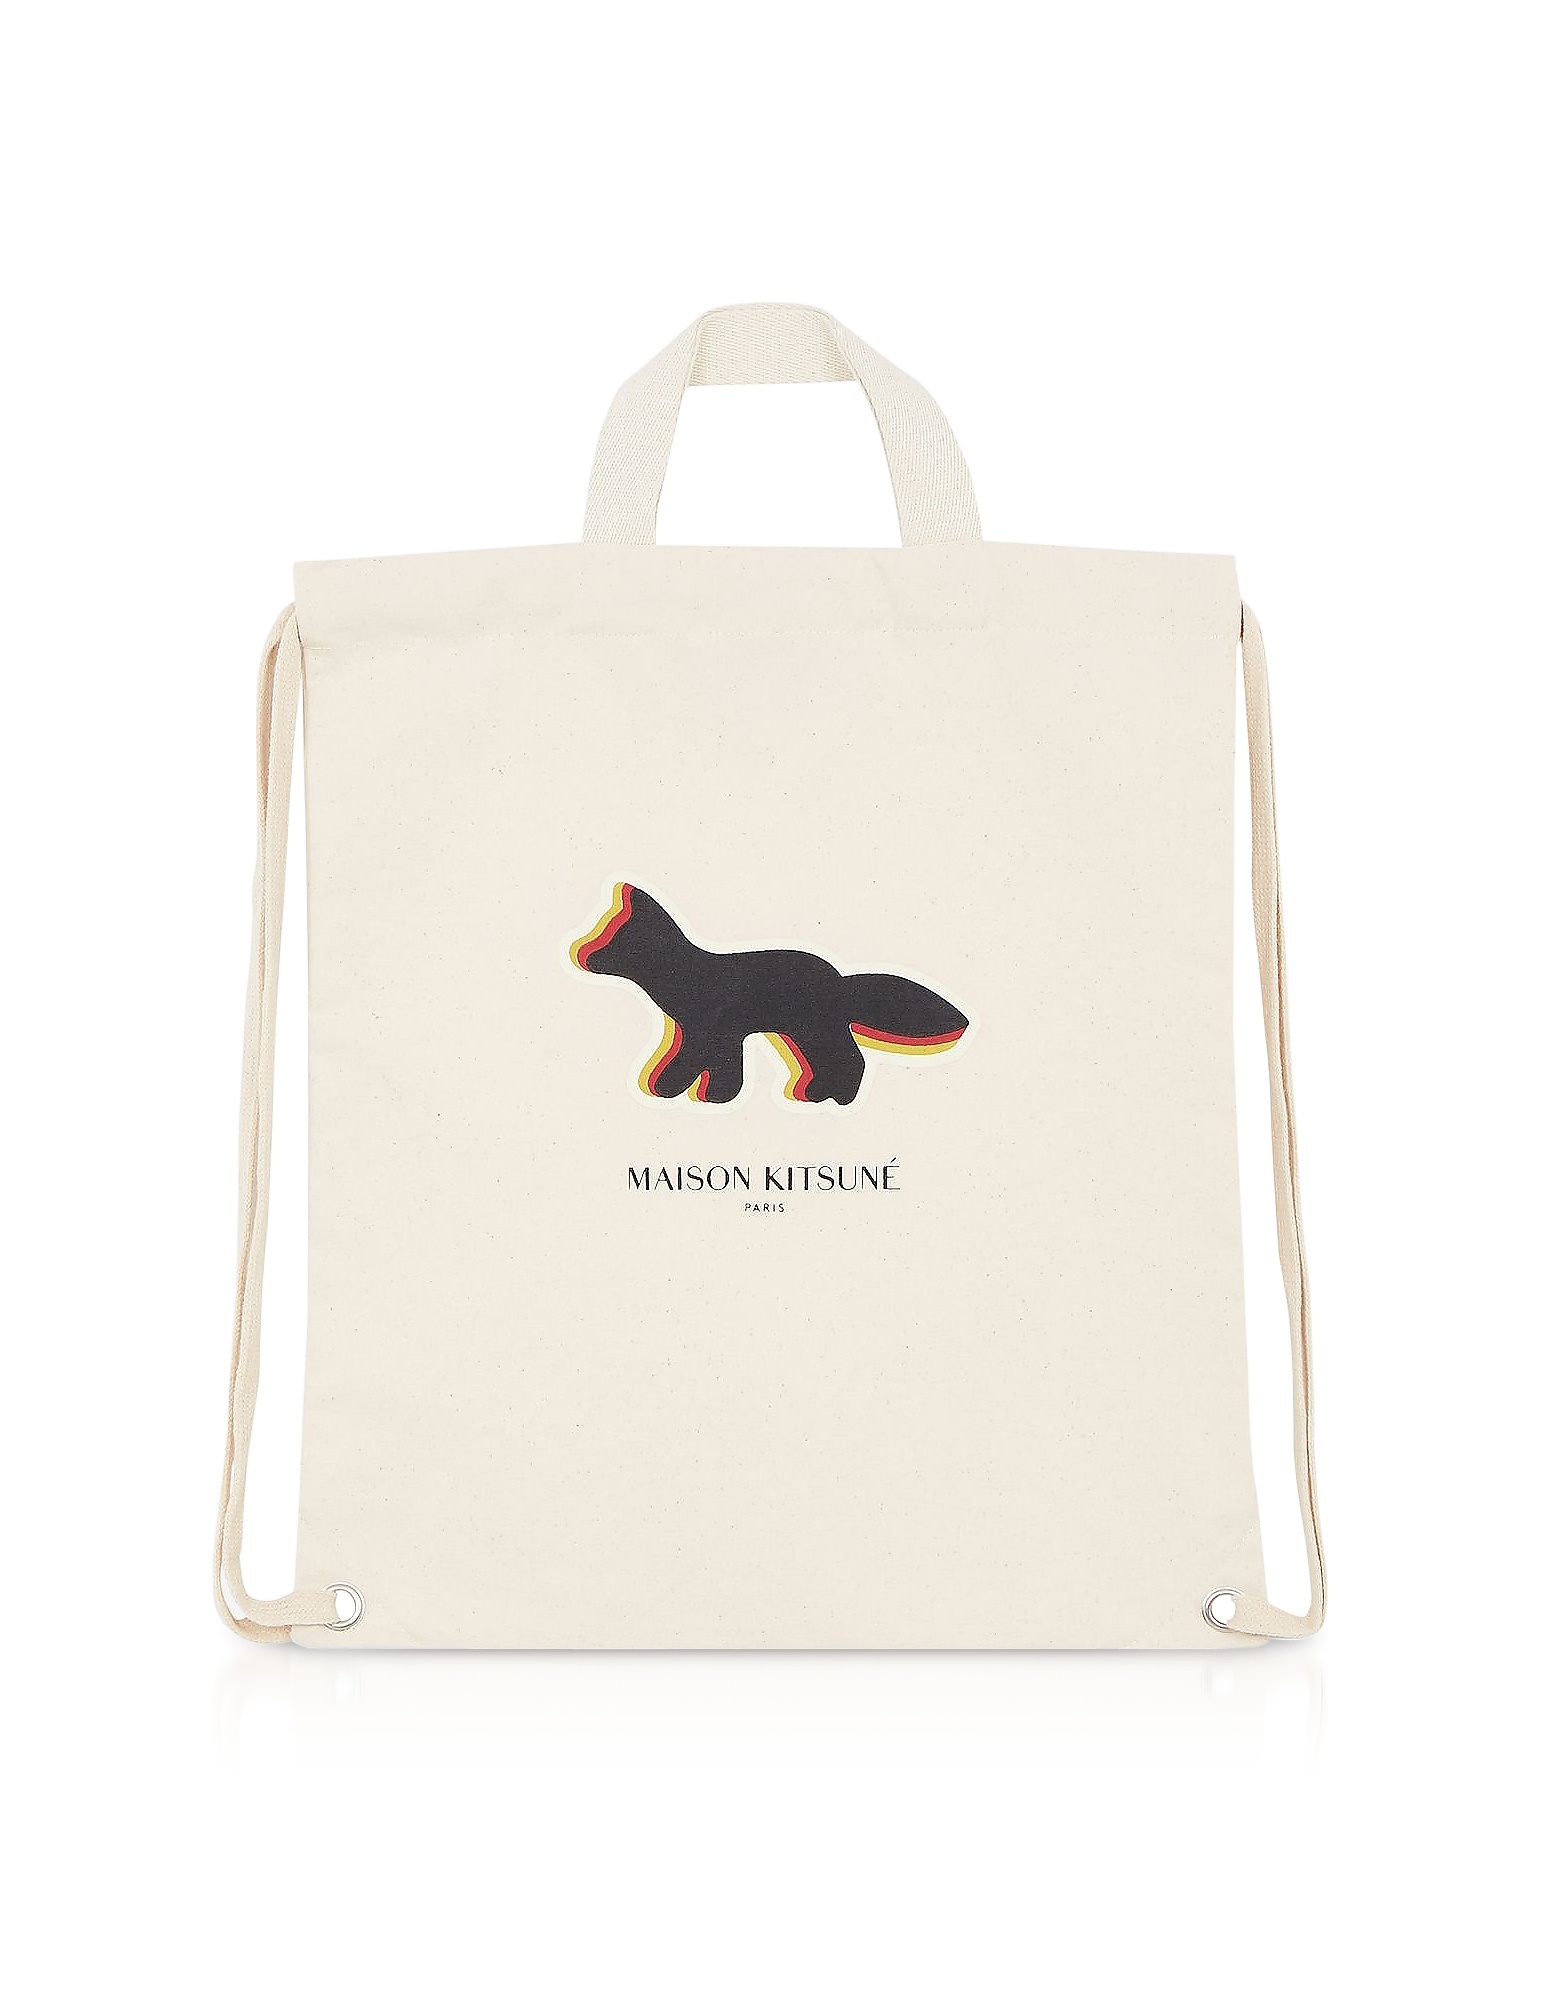 Image of Maison Kitsuné Designer Handbags, Quadri Fox Tote/Backpack